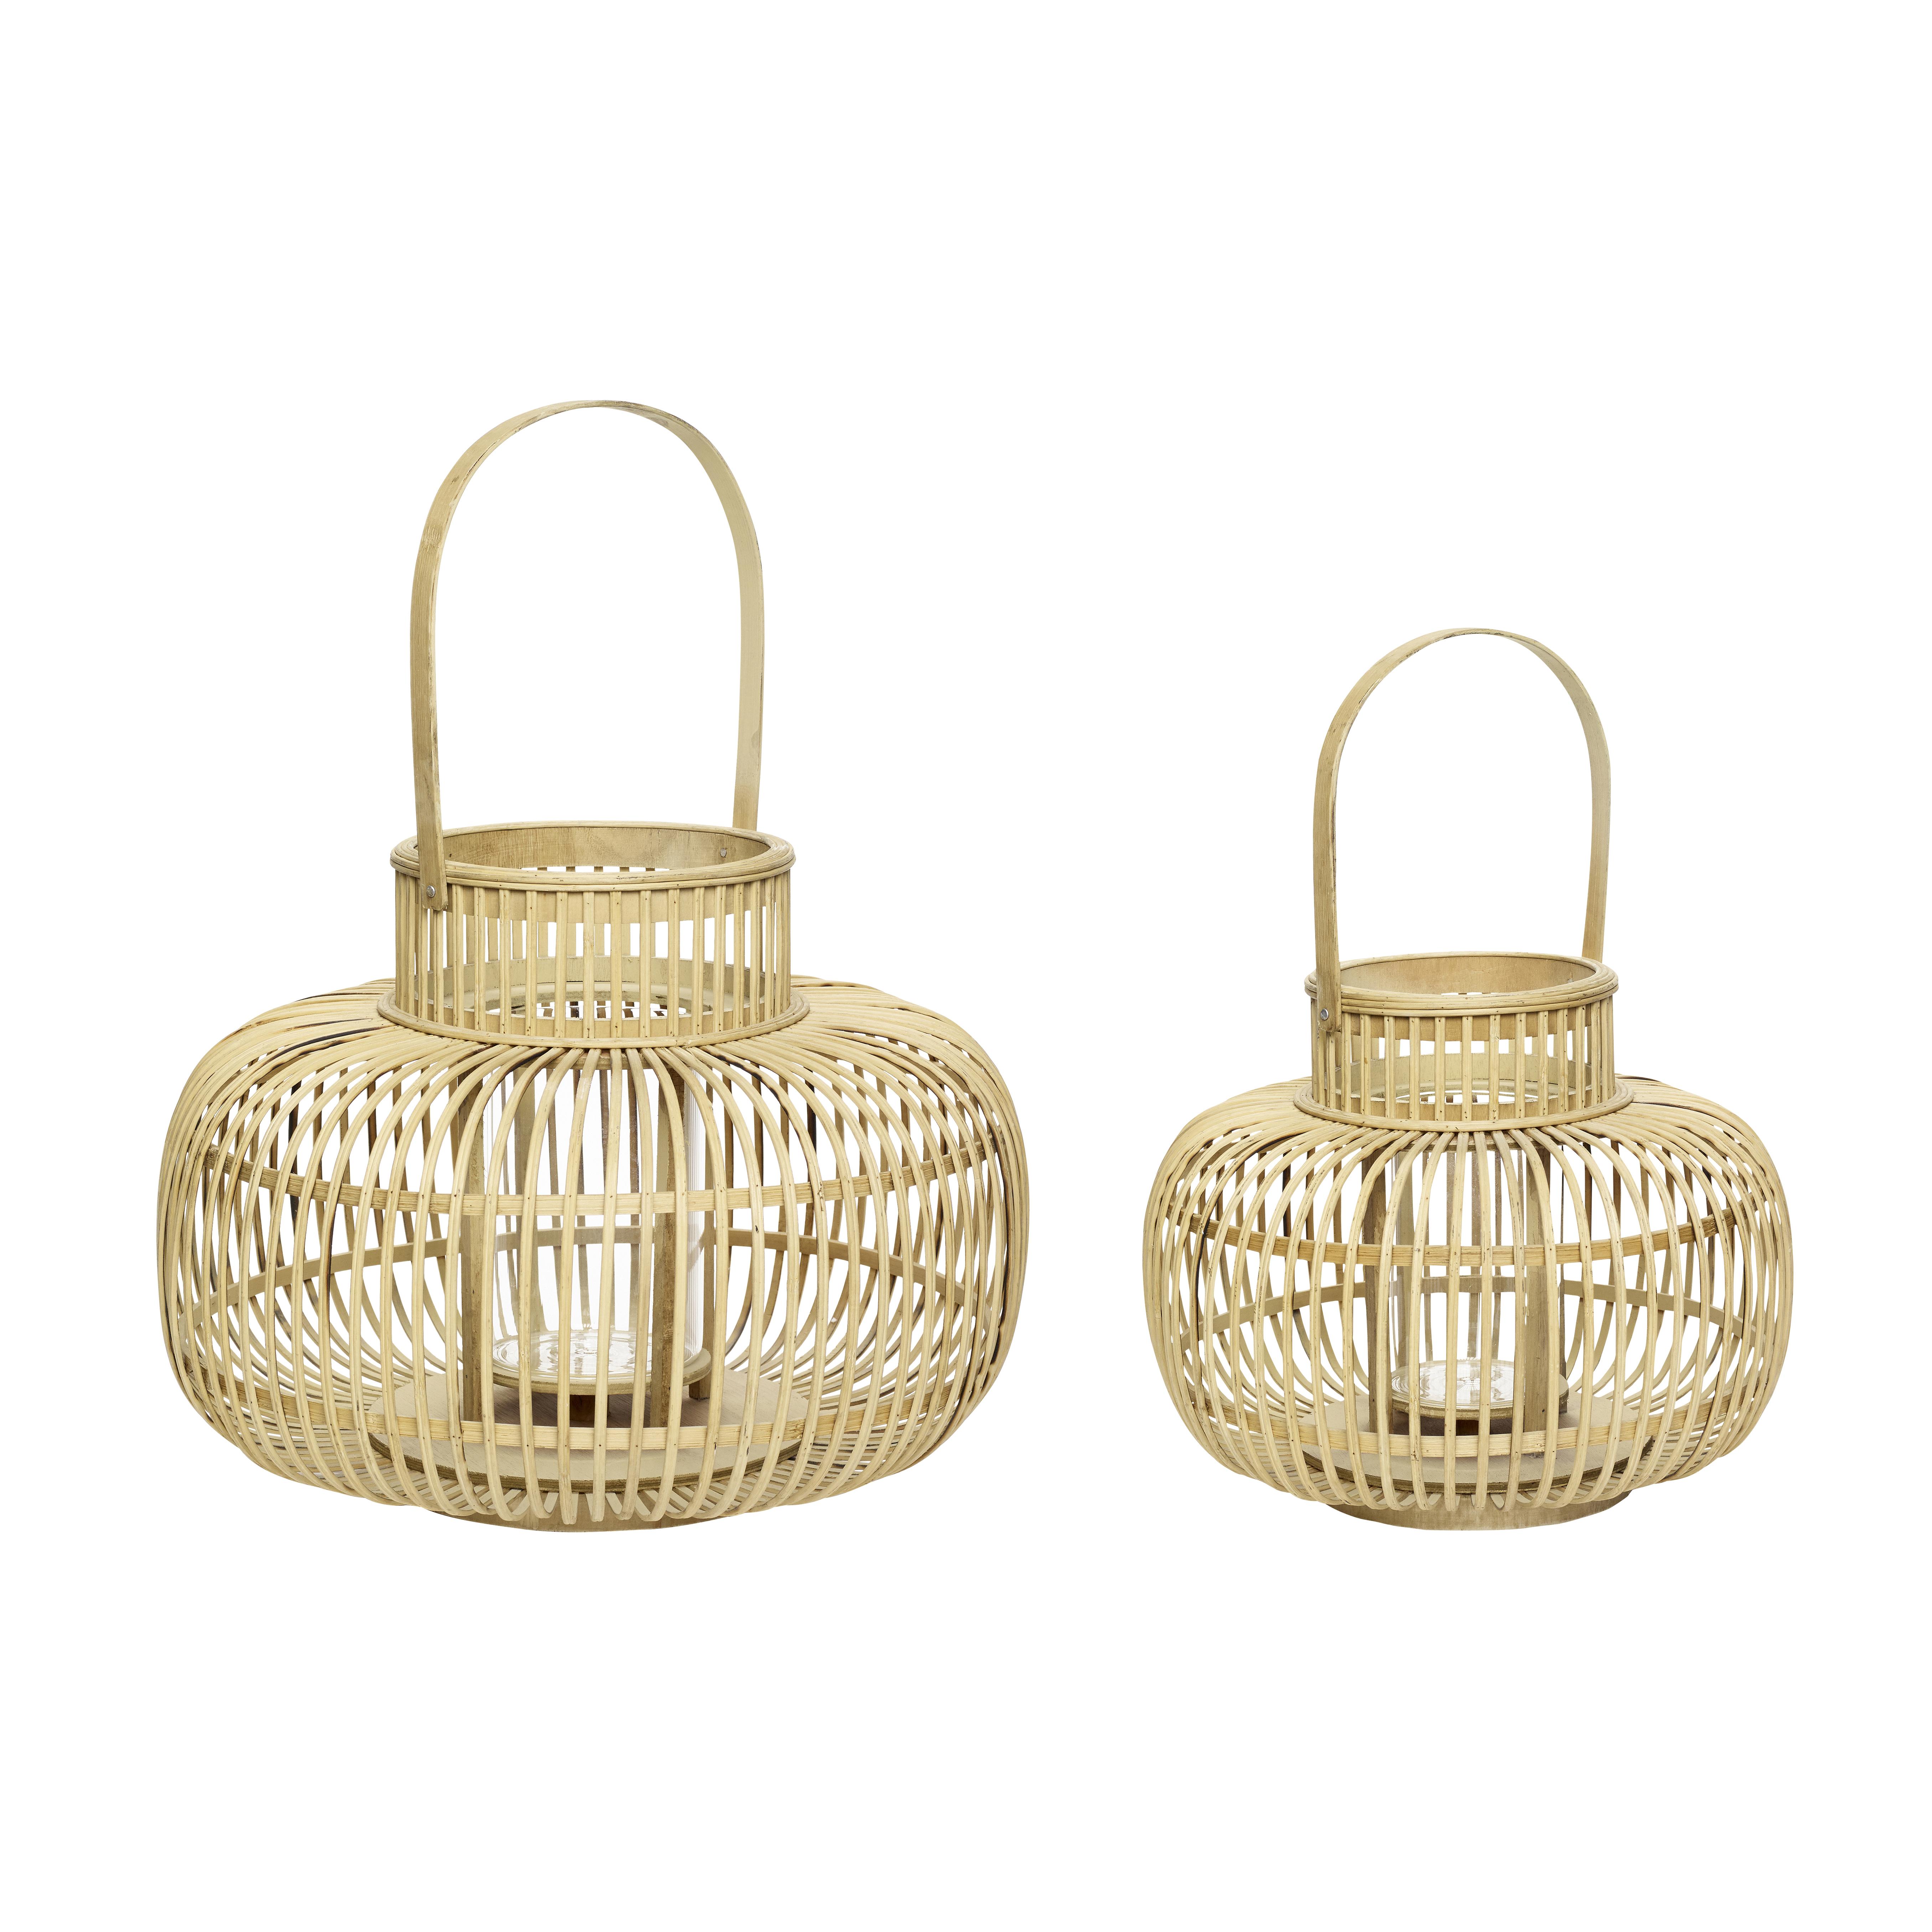 Lantern, bamboo, nature, s/2 - Hübsch.